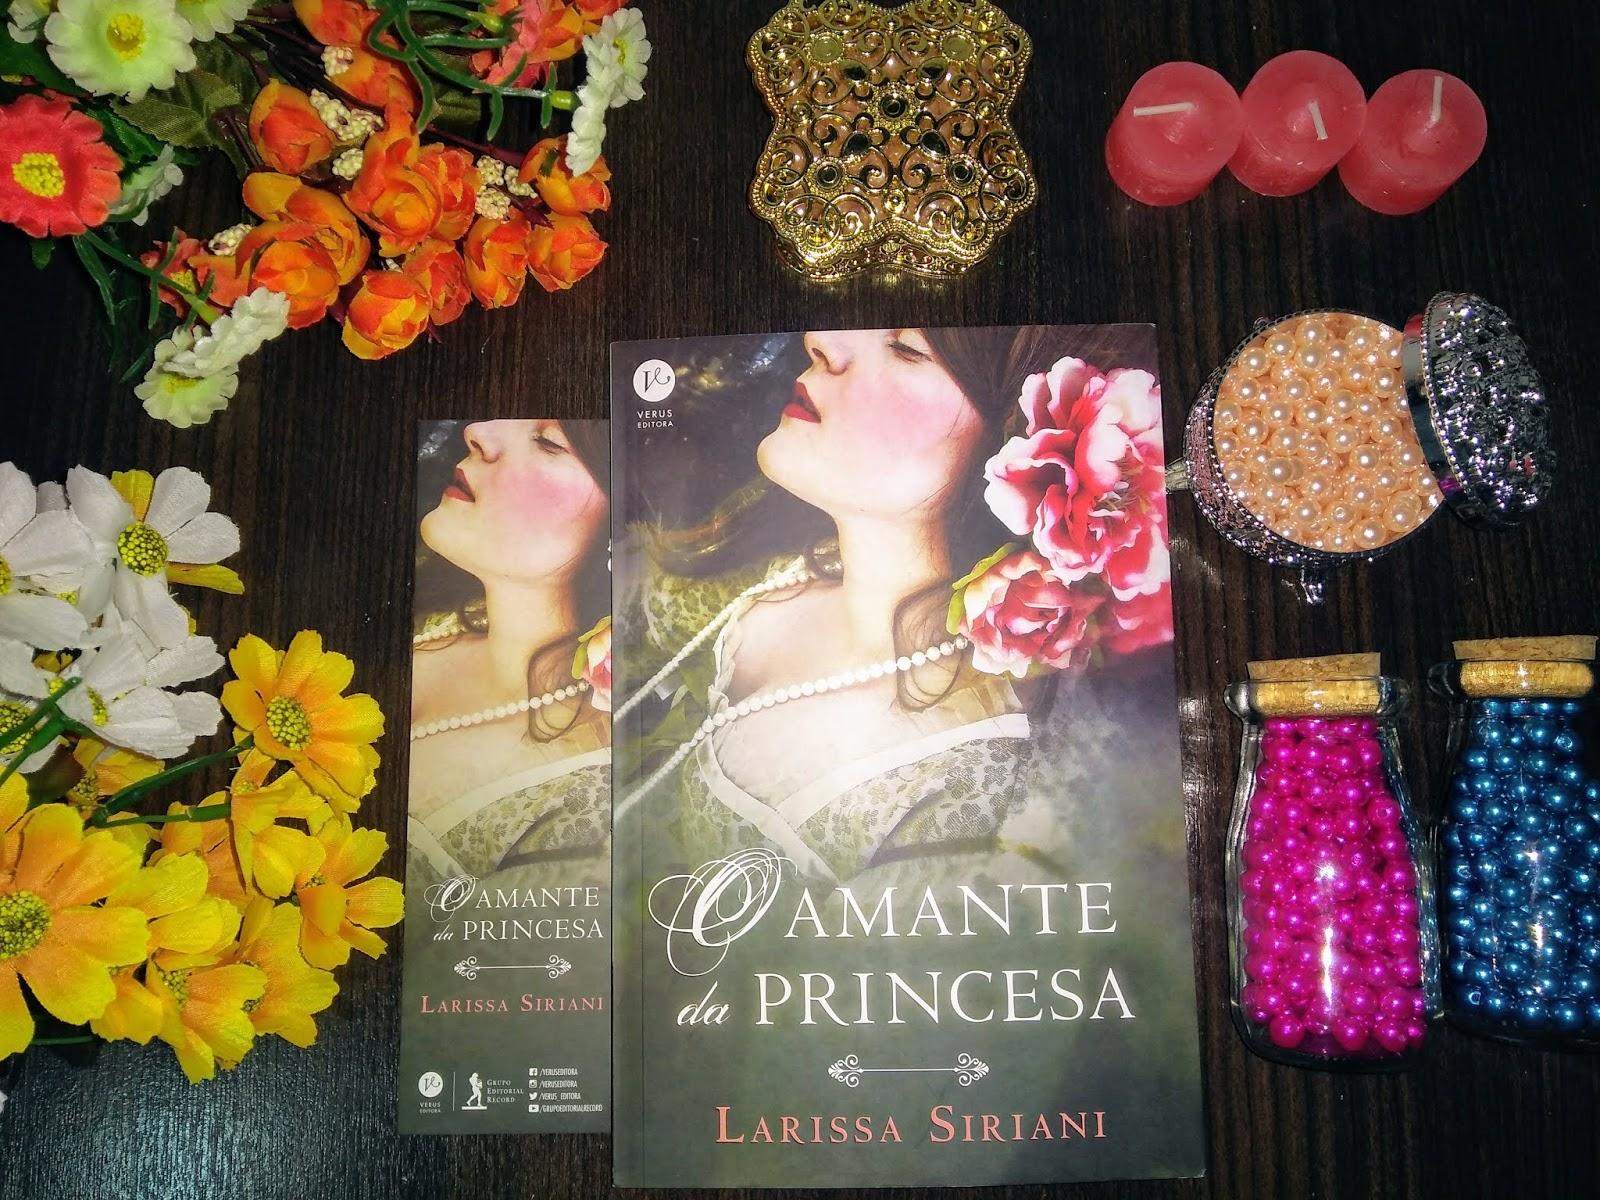 DICA DE LIVRO: O AMANTE DA PRINCESA - LARISSA SIRIANI